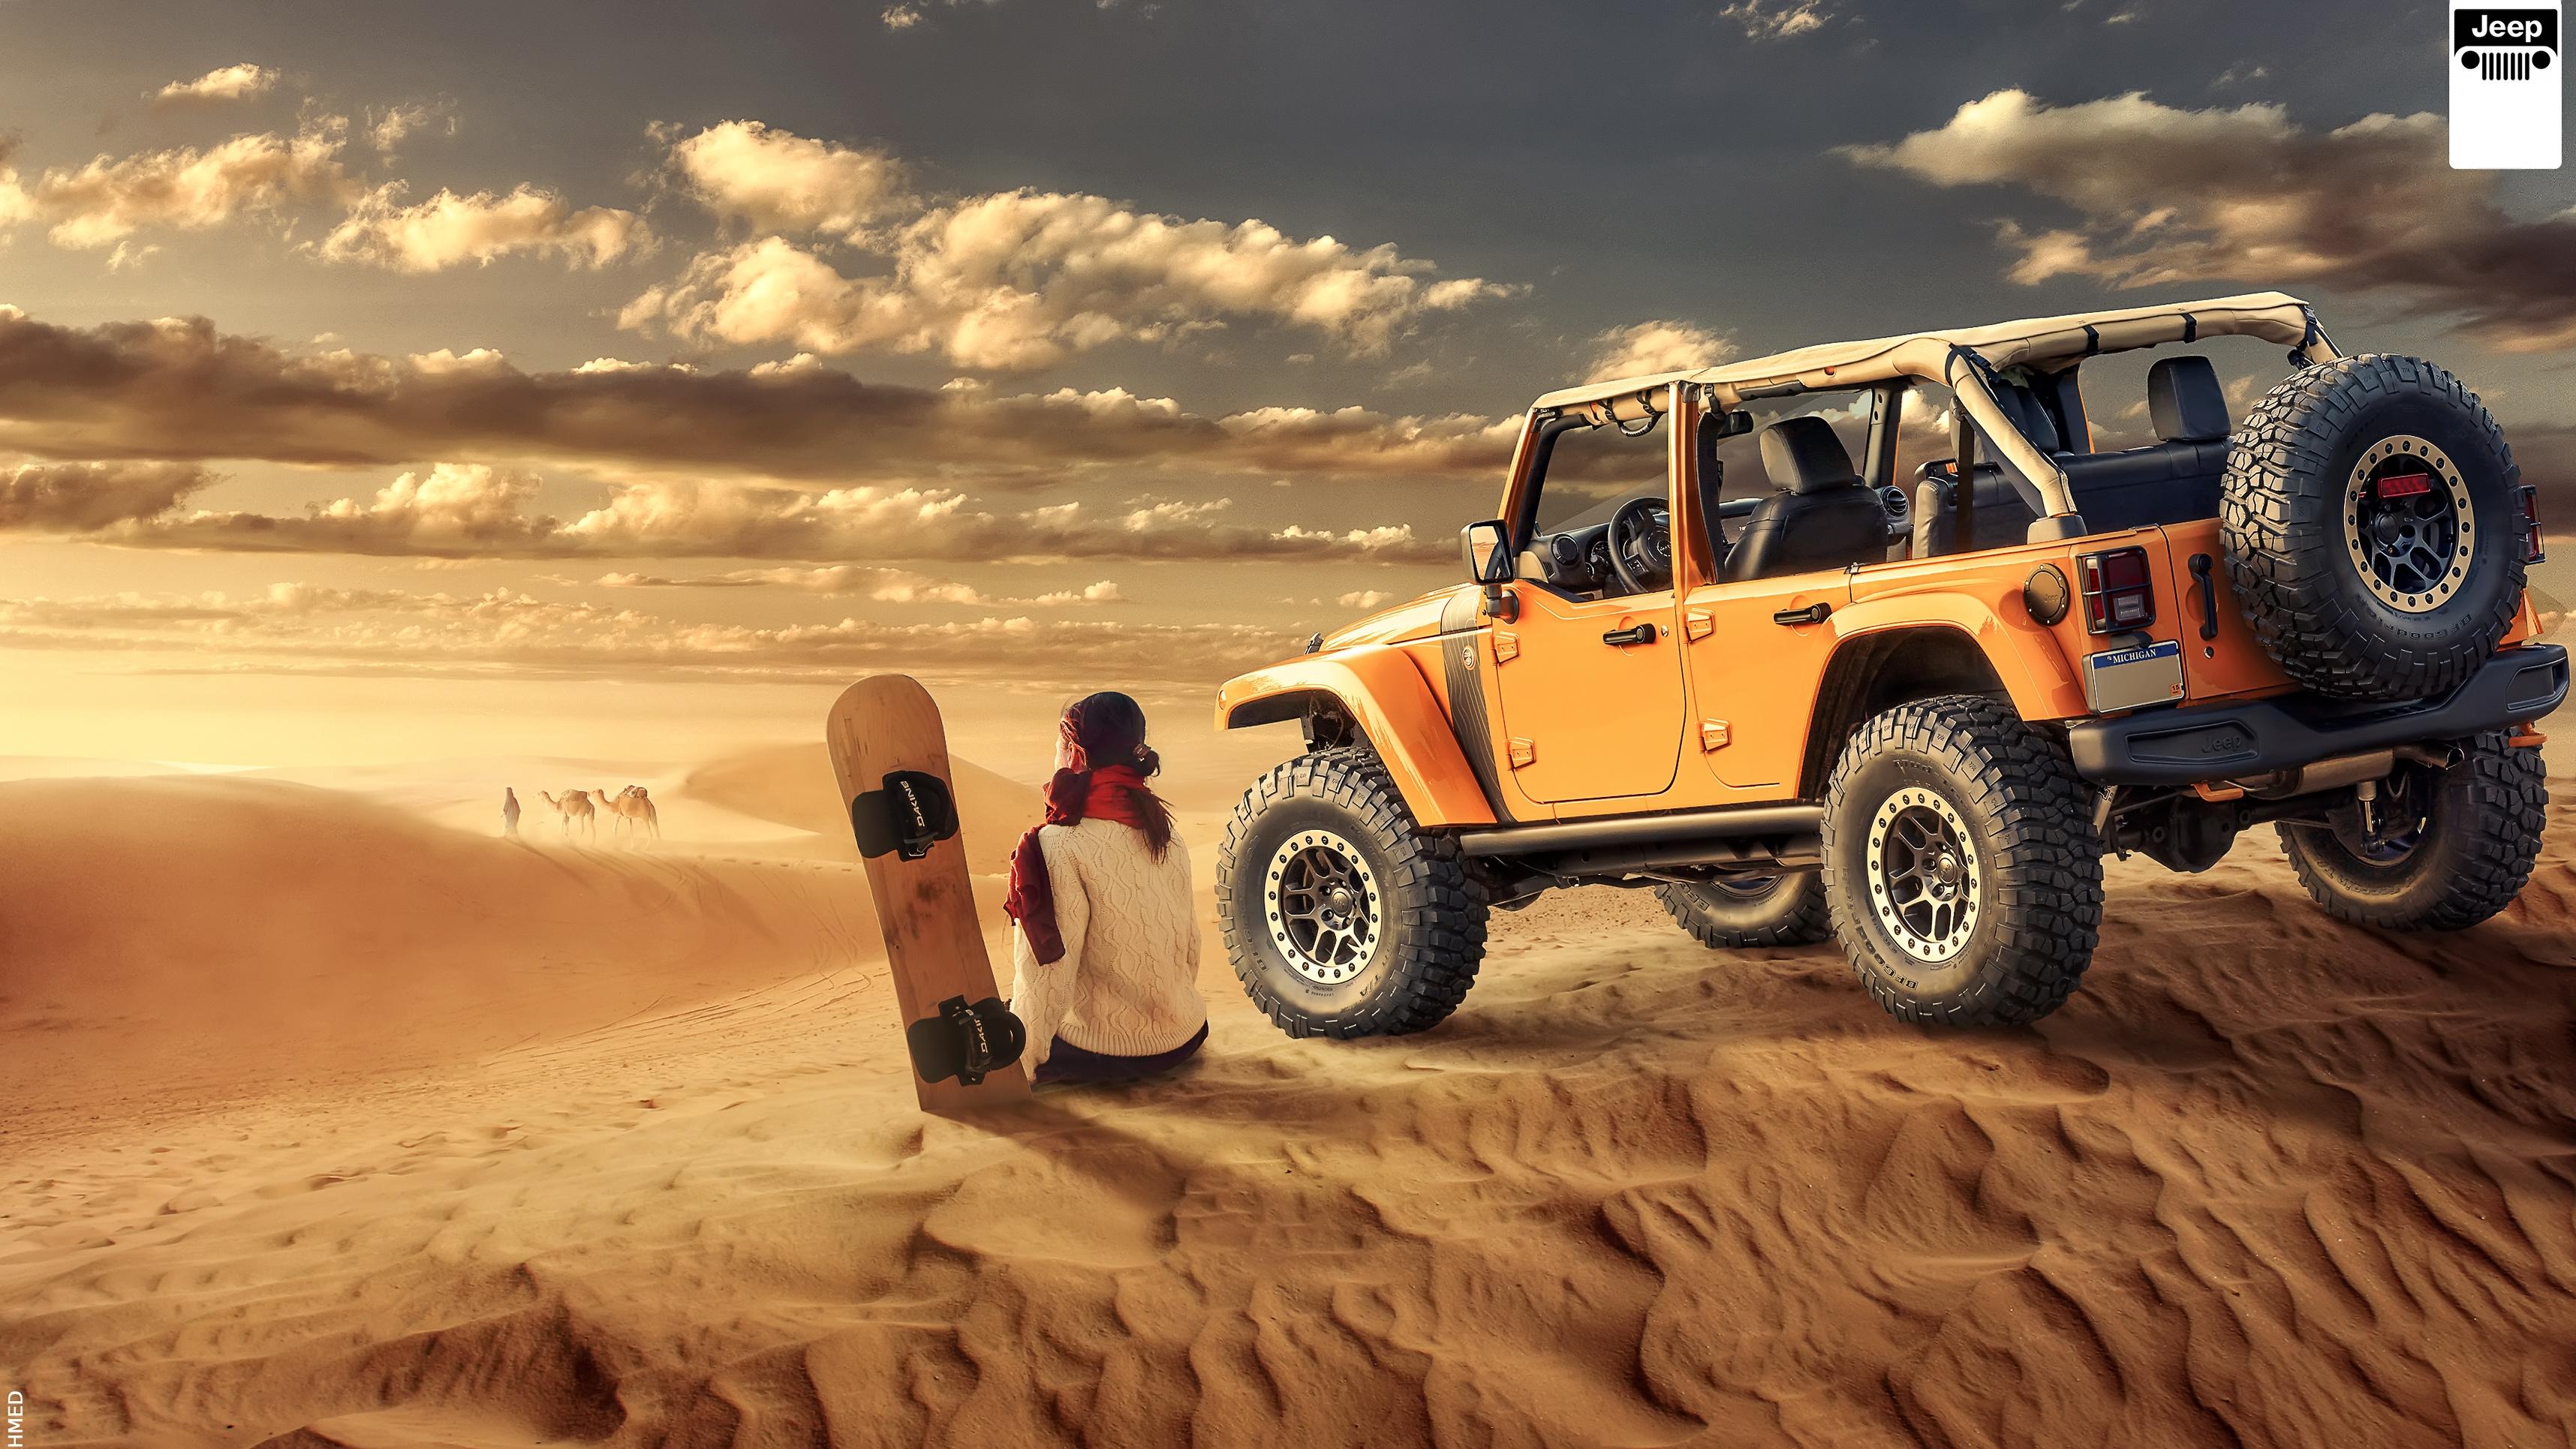 jeep wrangler desert off road HD